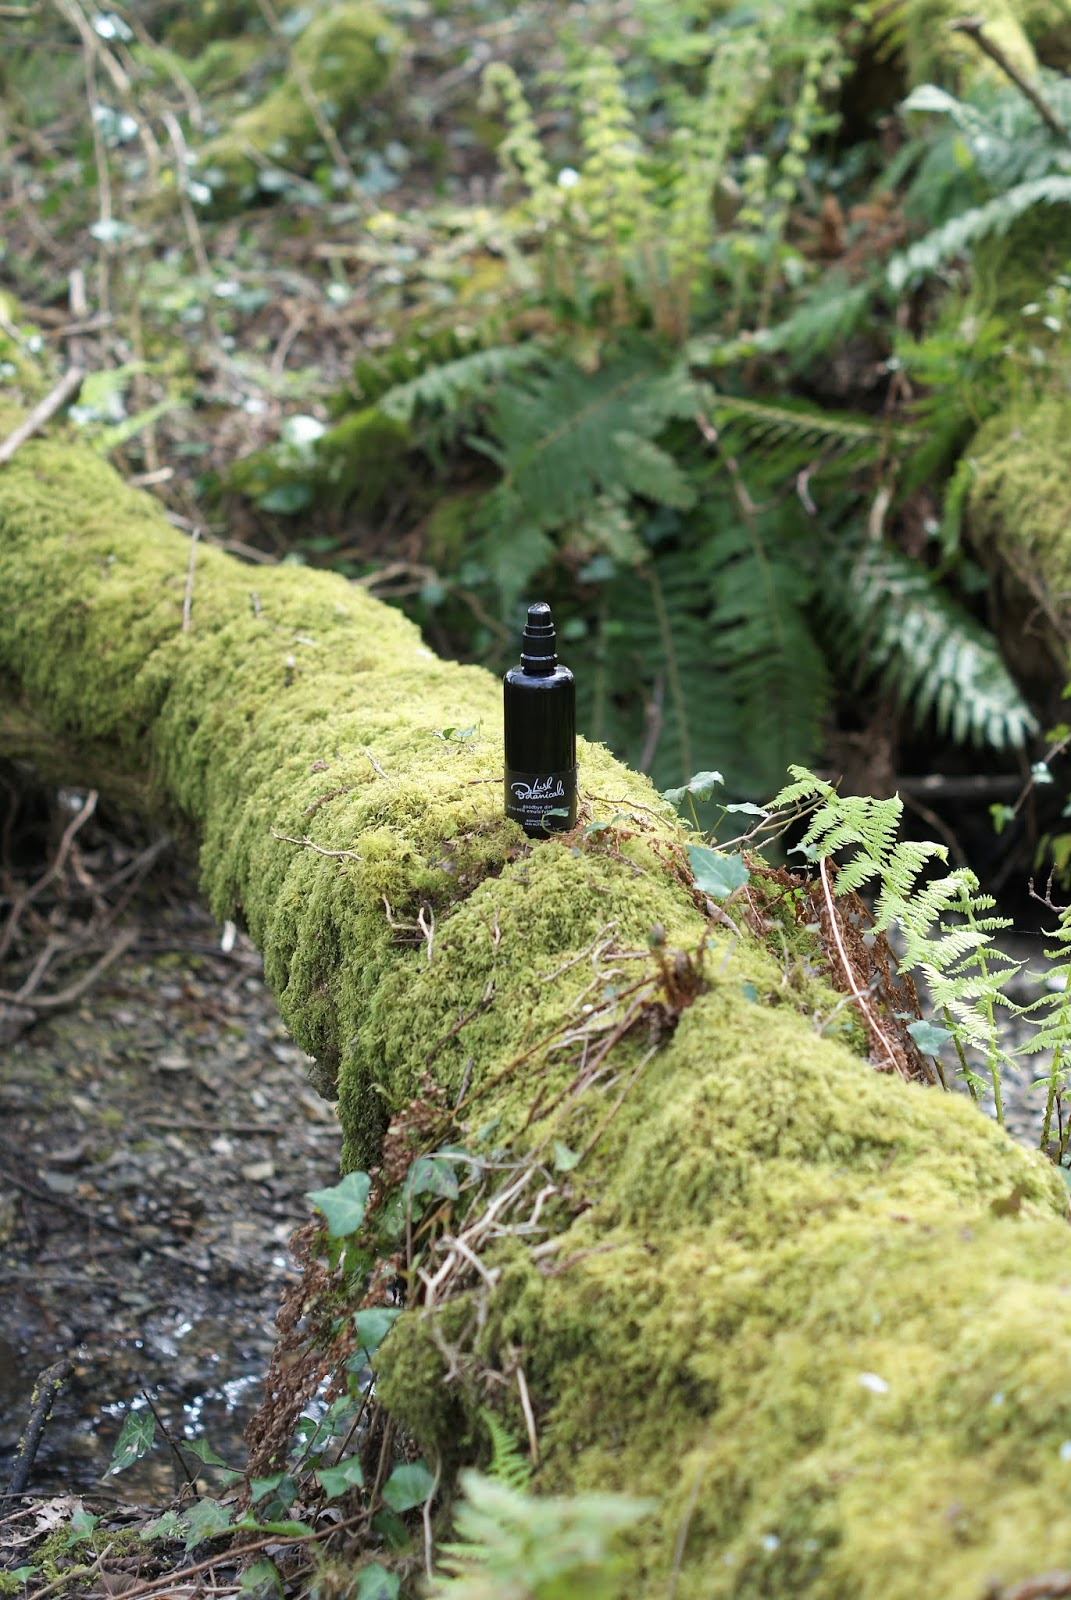 Olejek hydrofilowy Goodbye Dirt/ Lush Botanicals.